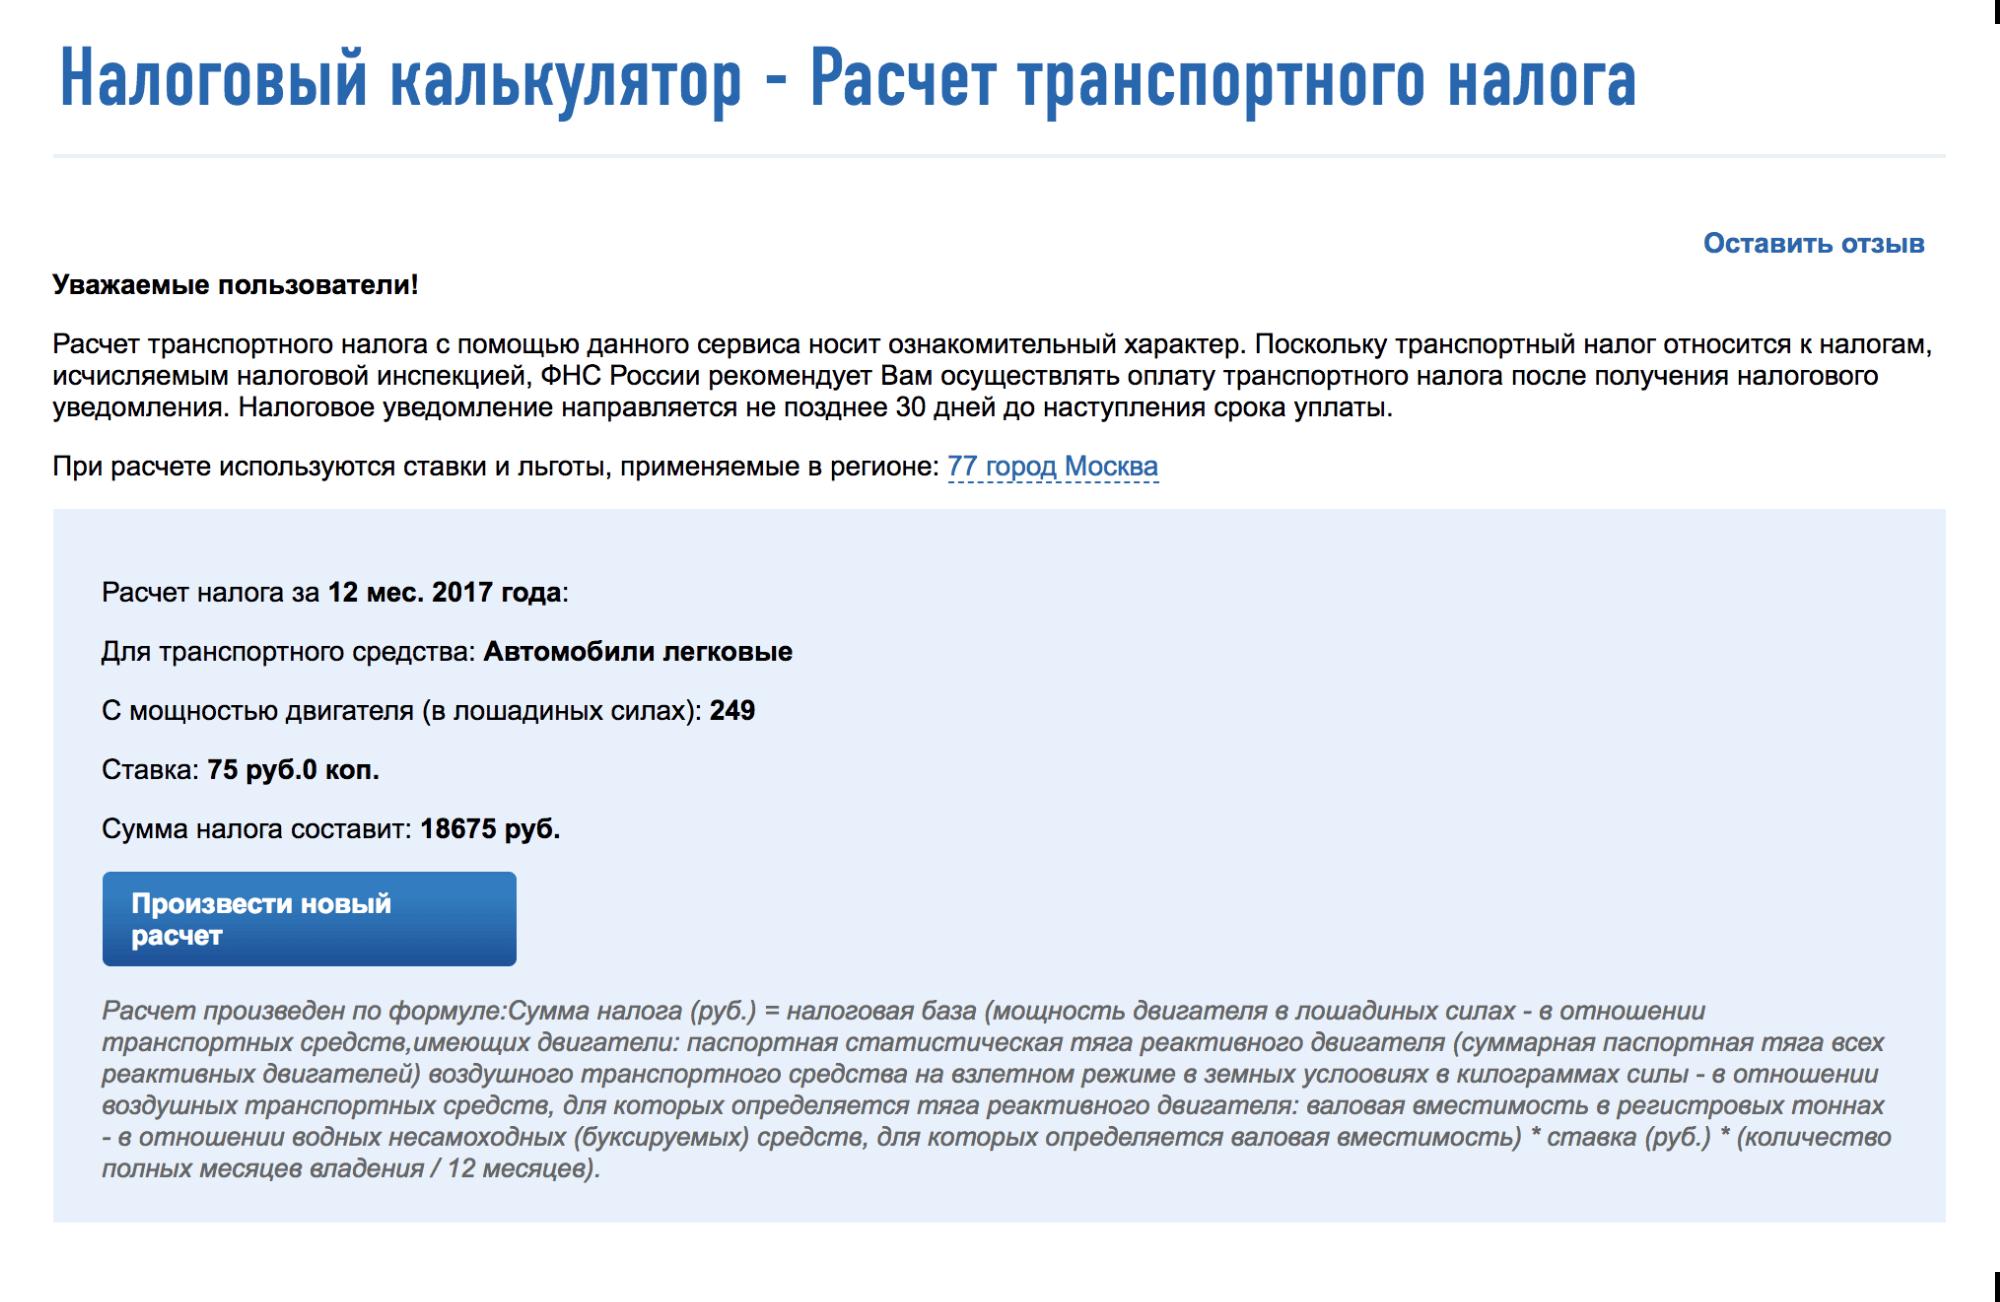 Транспортный налог 2011 ставки владимир транспортный налог ставки для краснодара